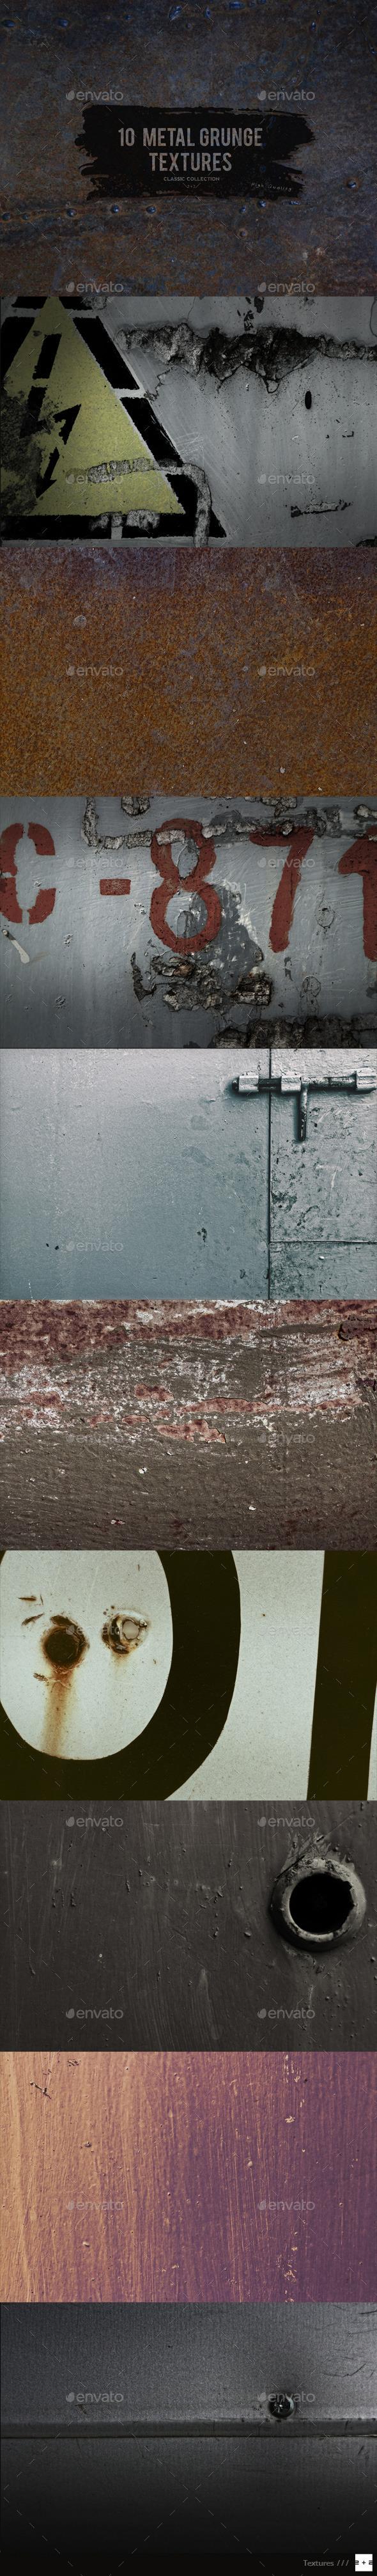 GraphicRiver 10 Metal Grunge Textures 10457319